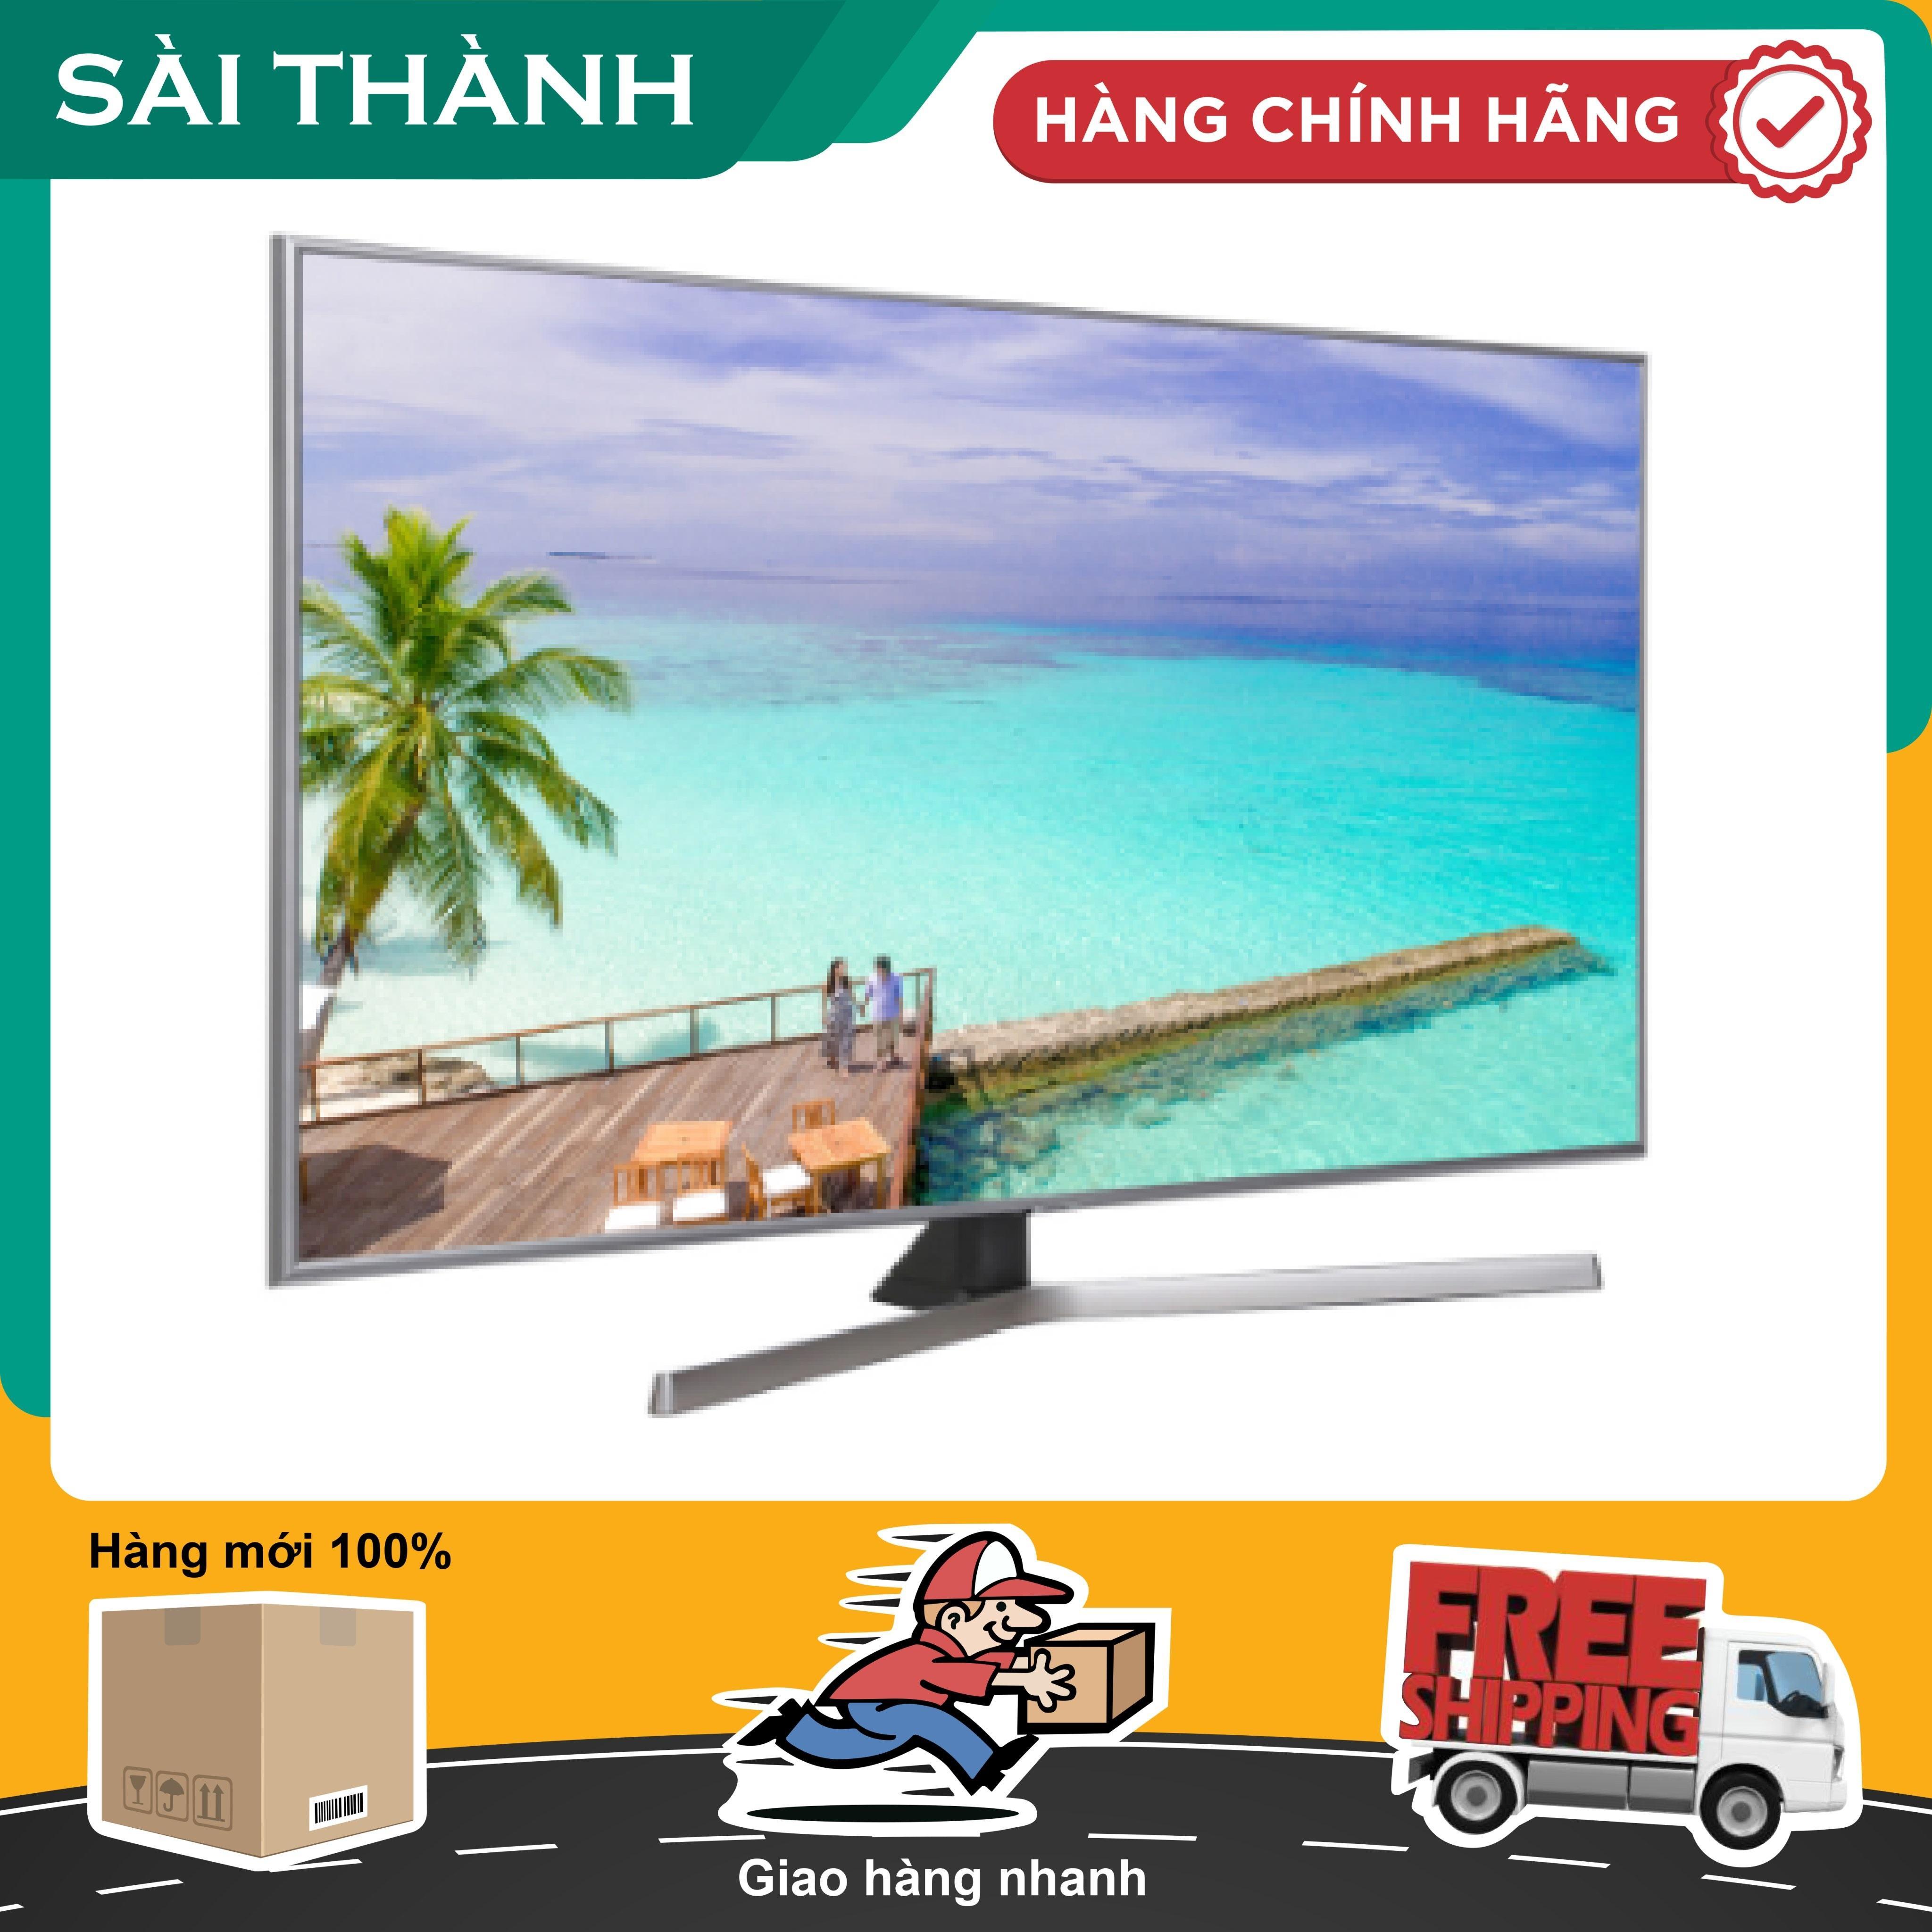 Bảng giá Smart Tivi Samsung 4K 65 inch UA65RU7400 Mẫu 2019